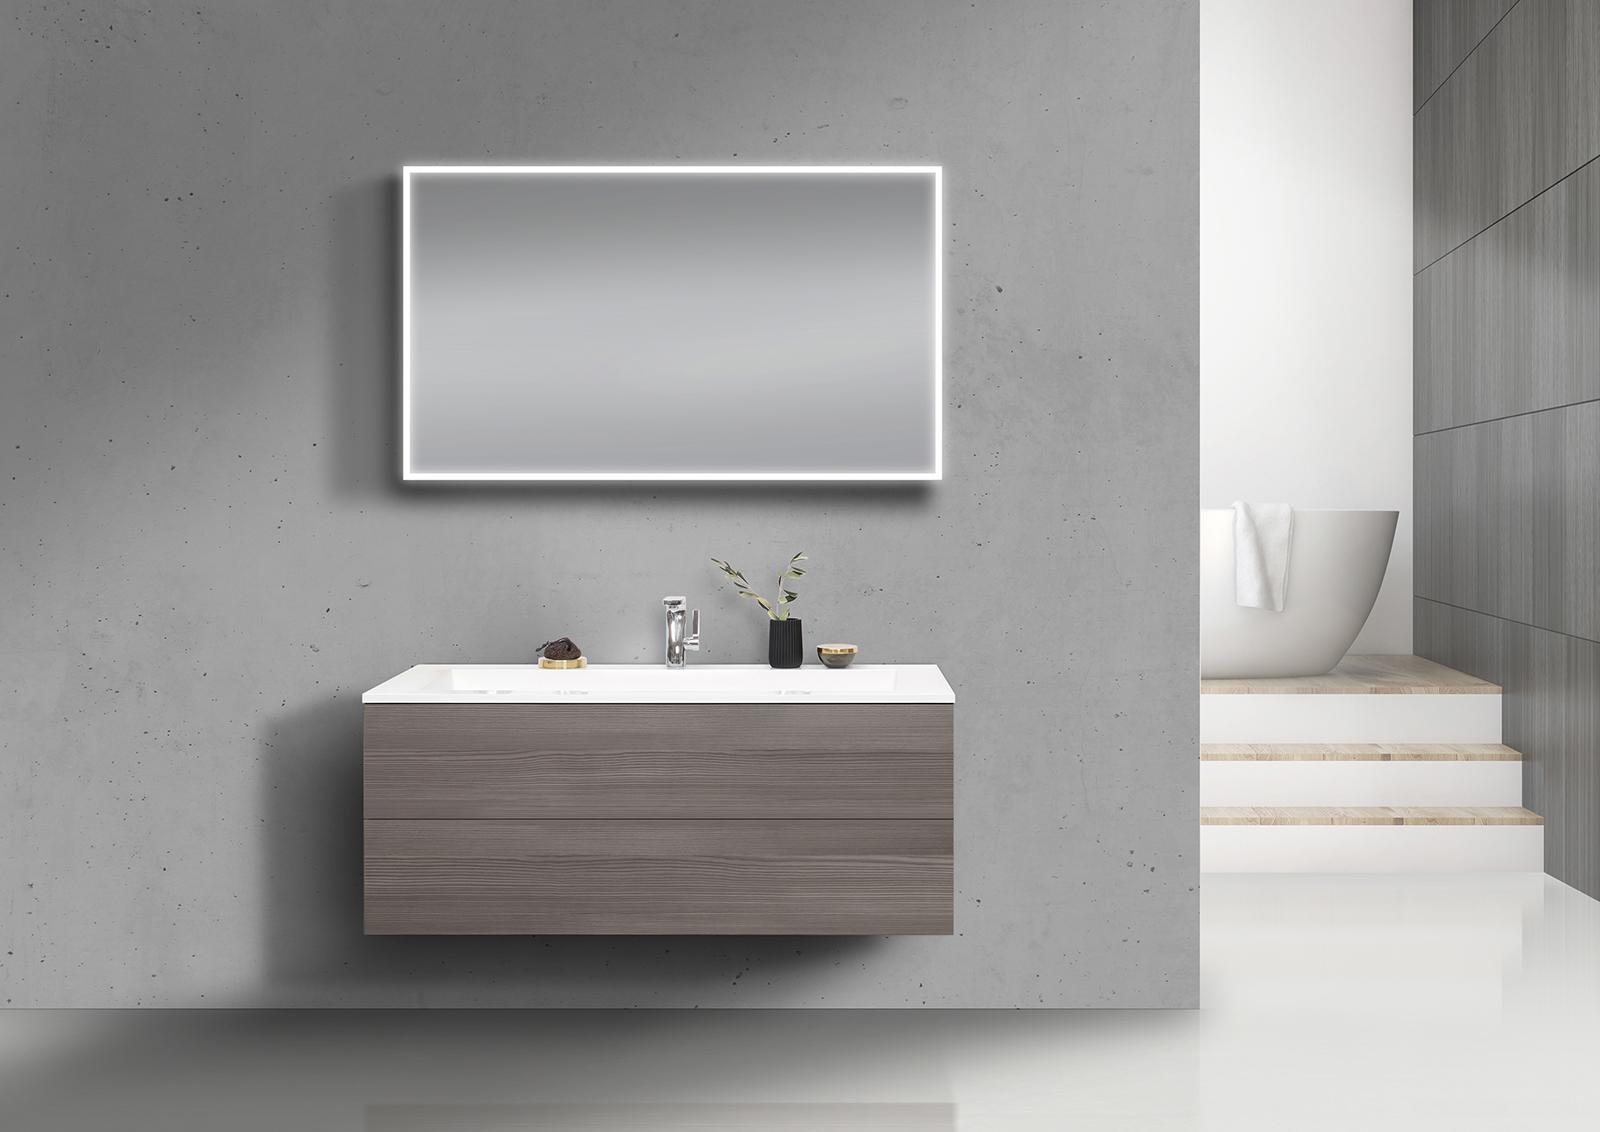 intarbad cubo badm bel set grifflos 120 cm waschtisch mit. Black Bedroom Furniture Sets. Home Design Ideas